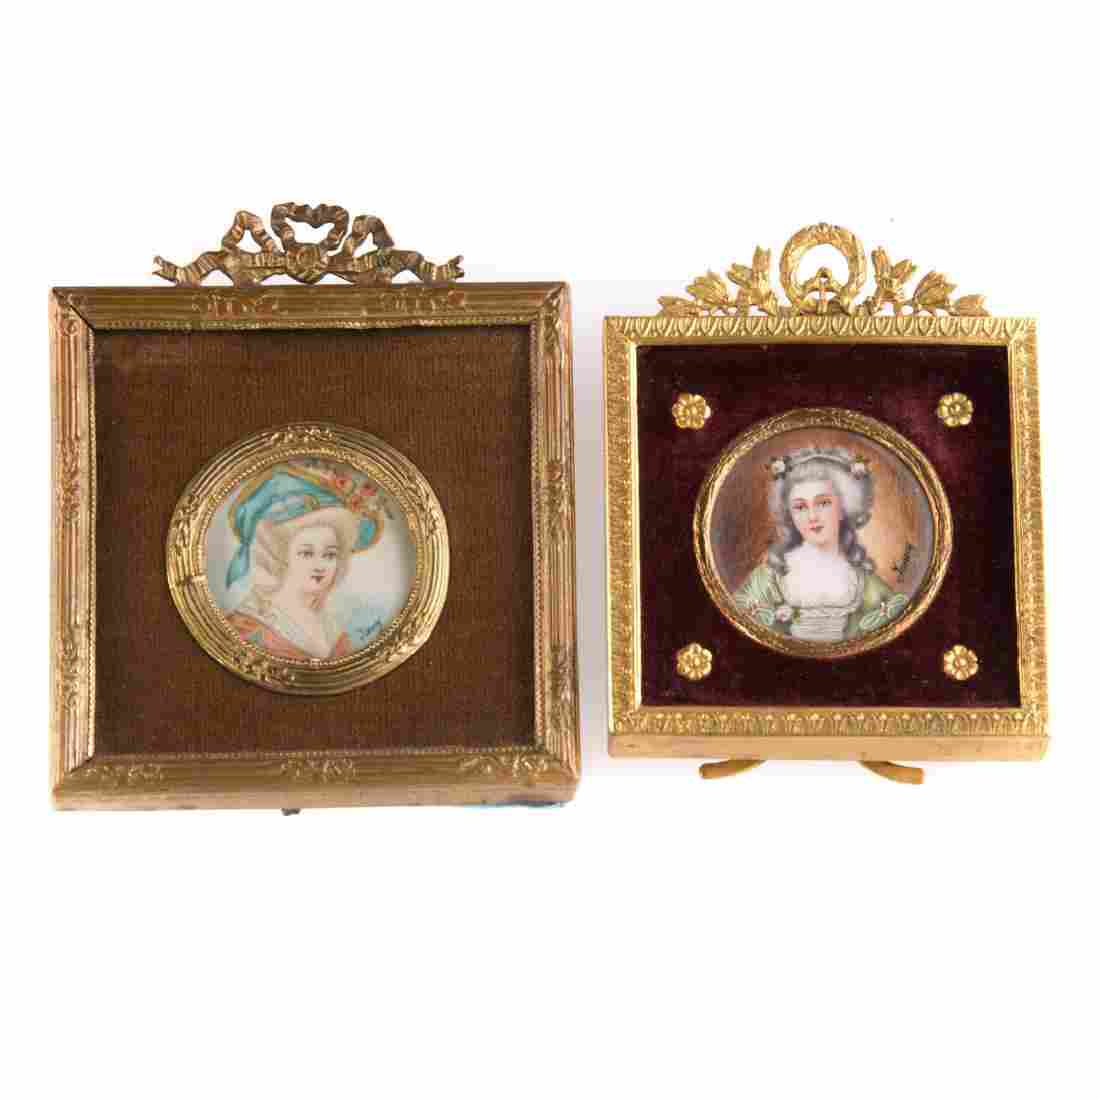 Two continental school miniature portraits